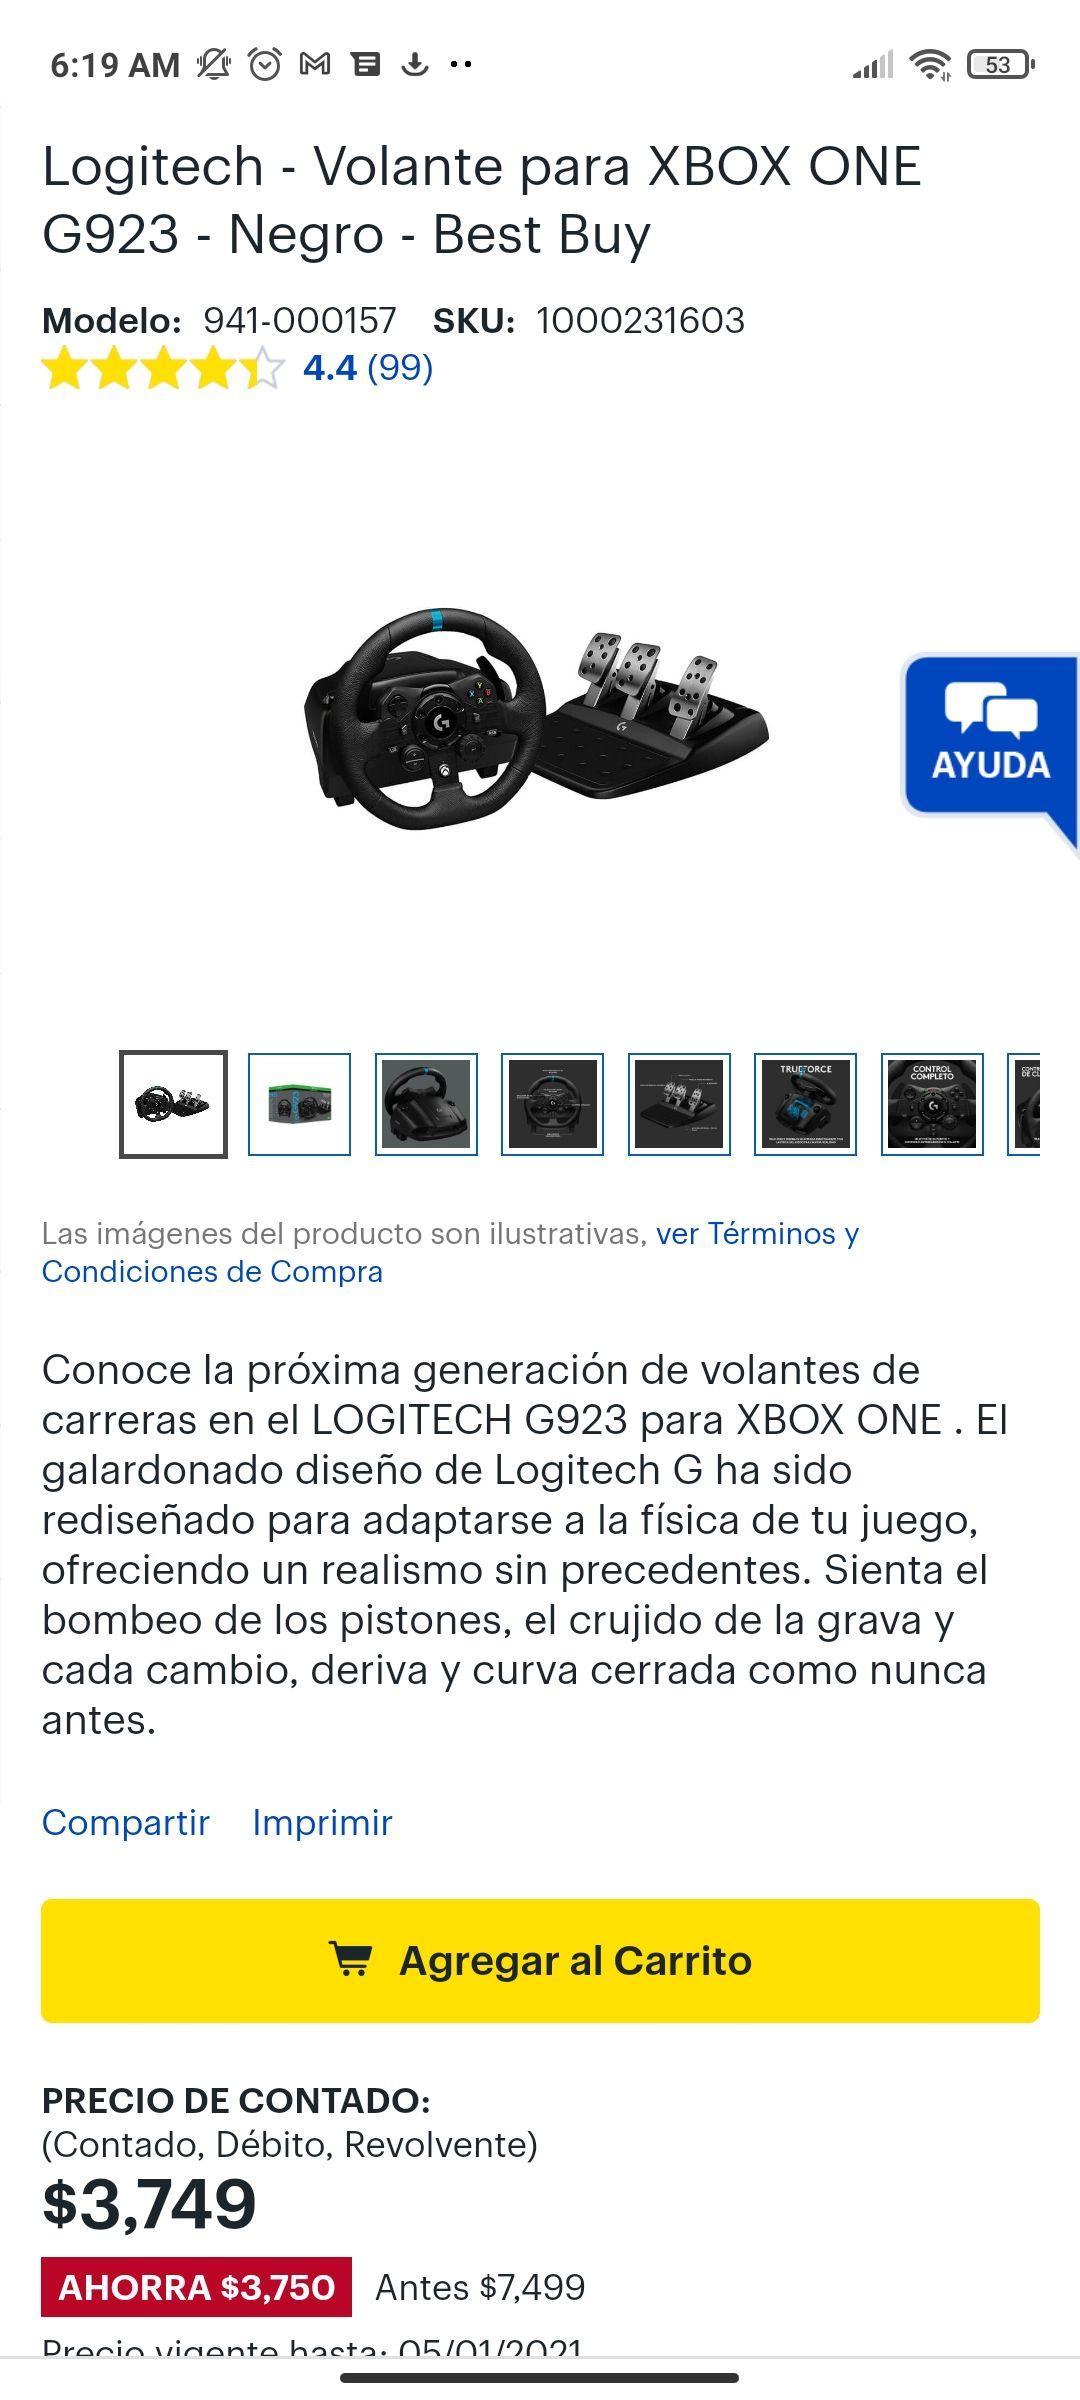 Logitech - Volante para XBOX ONE G923 - Negro - Best Buy